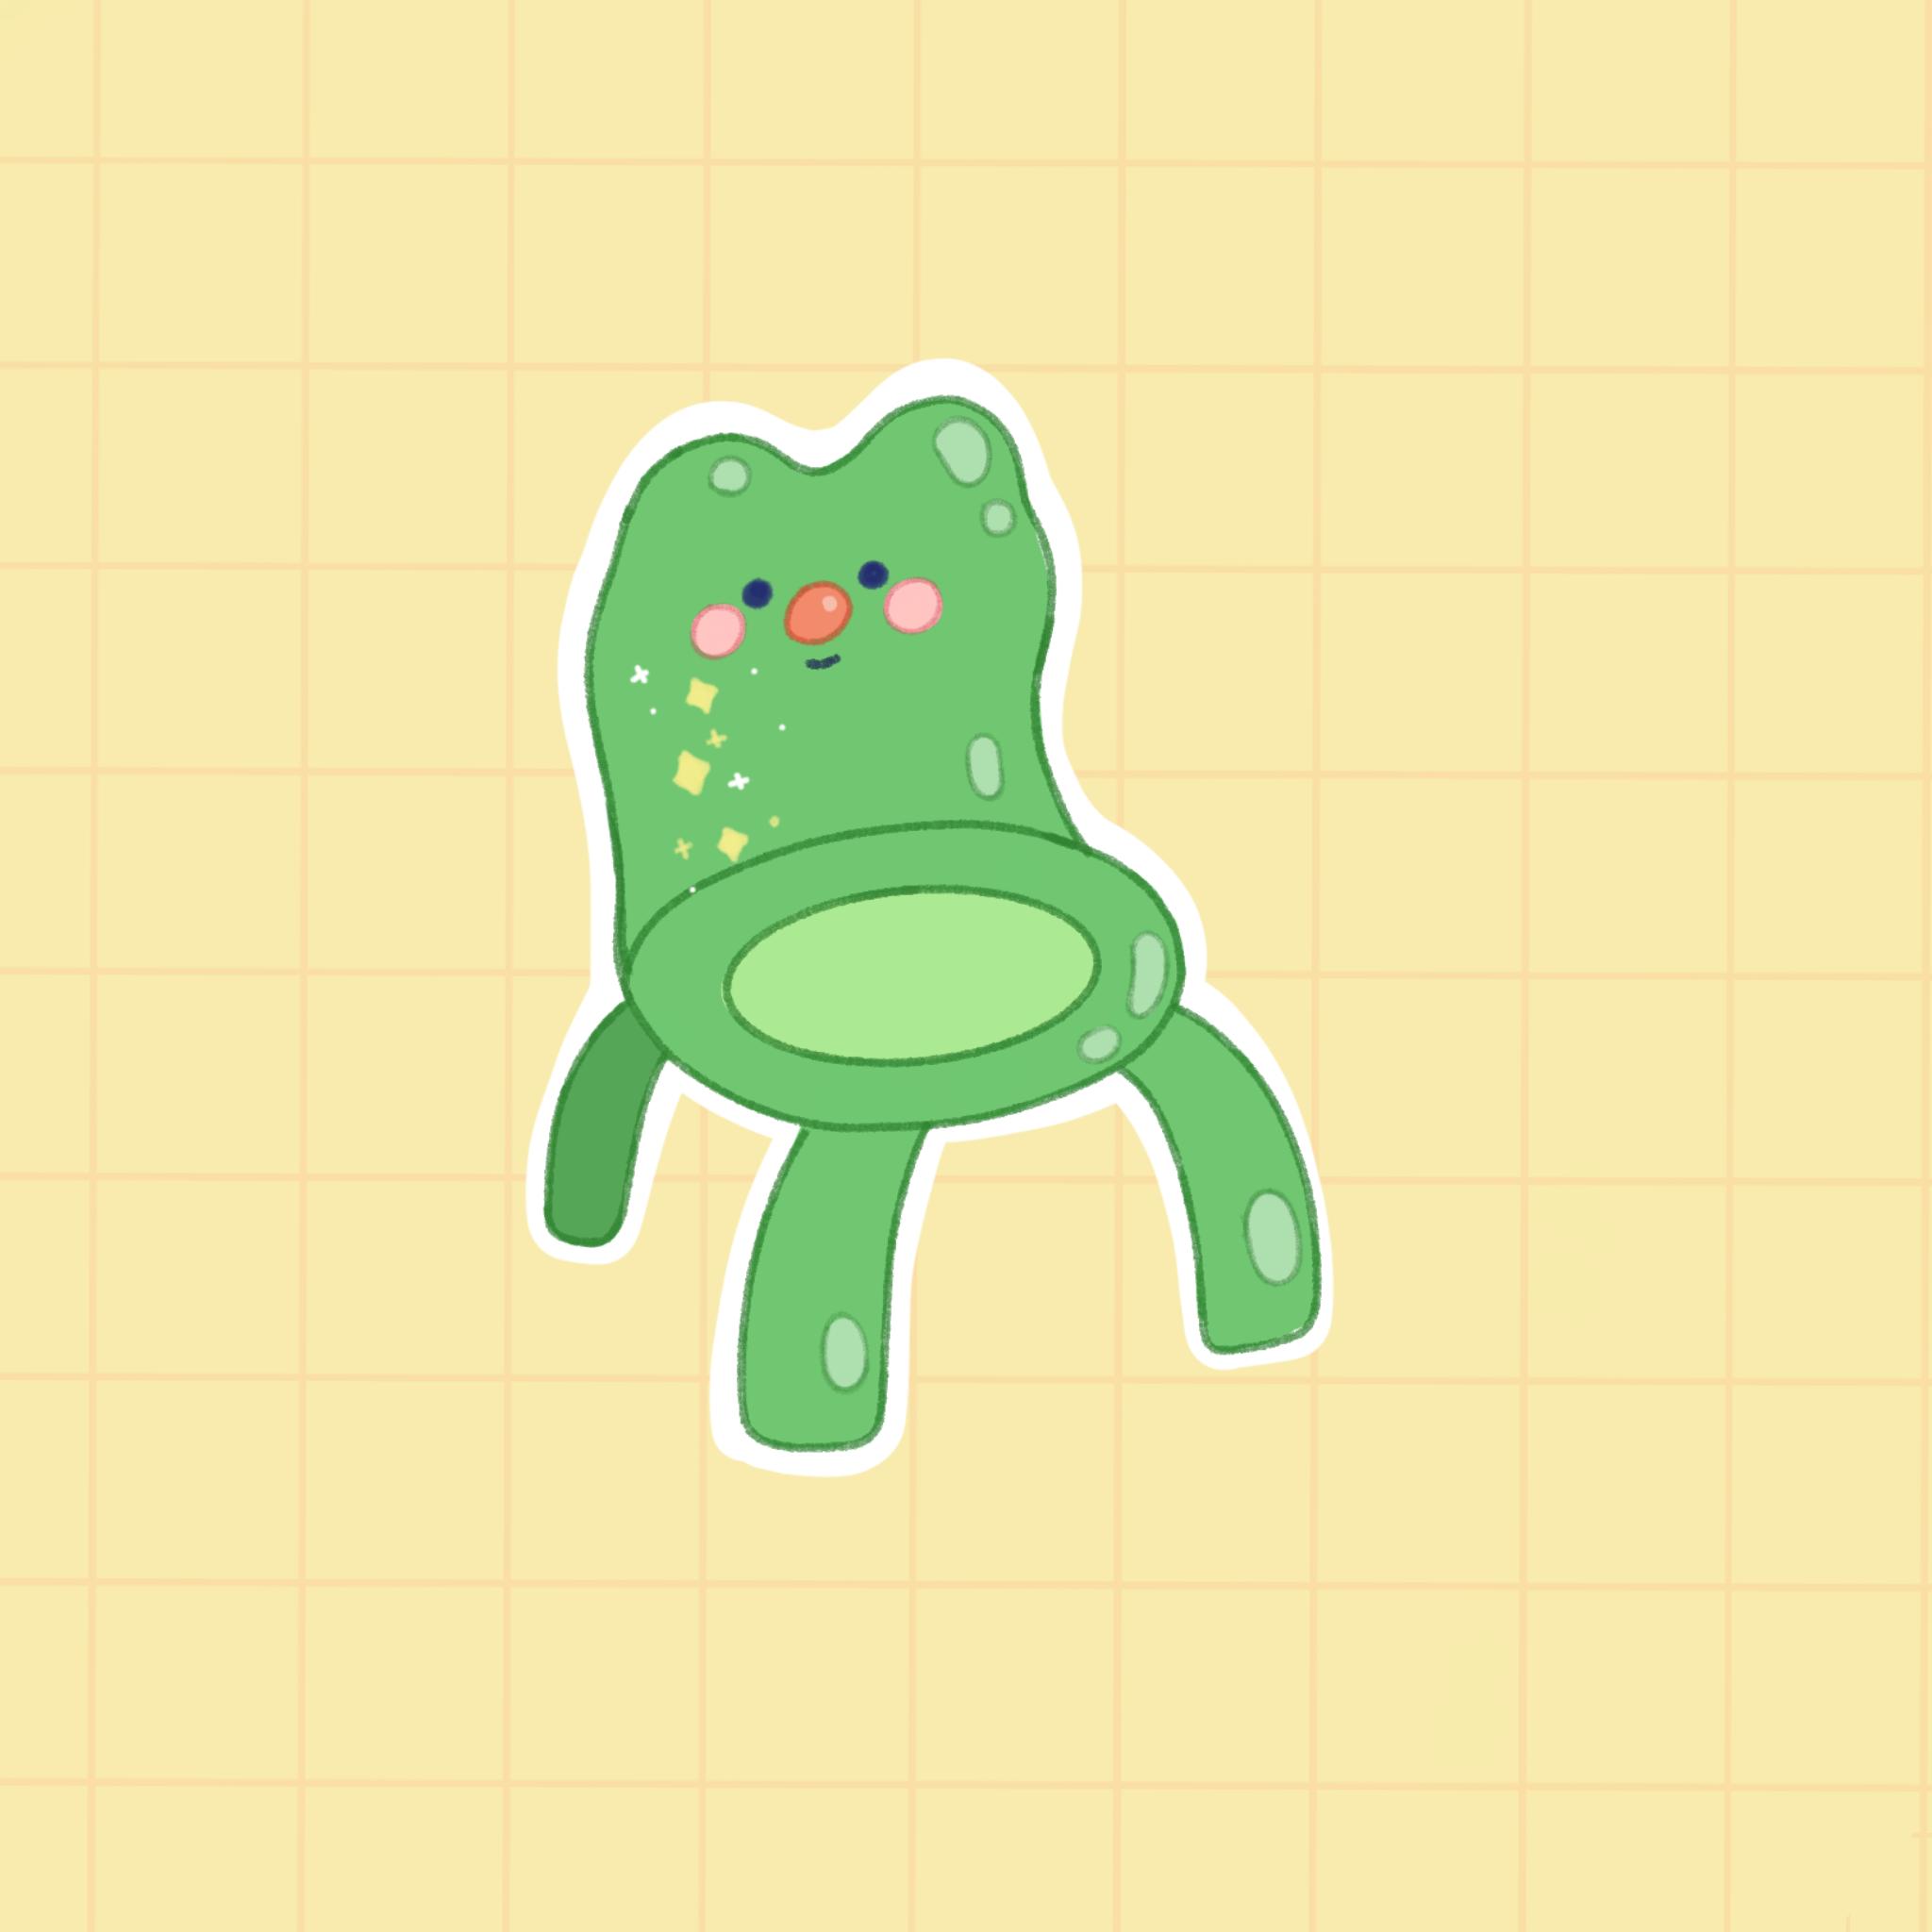 froggy chair 🐸 in 2020 Animal crossing, Elli, Animals